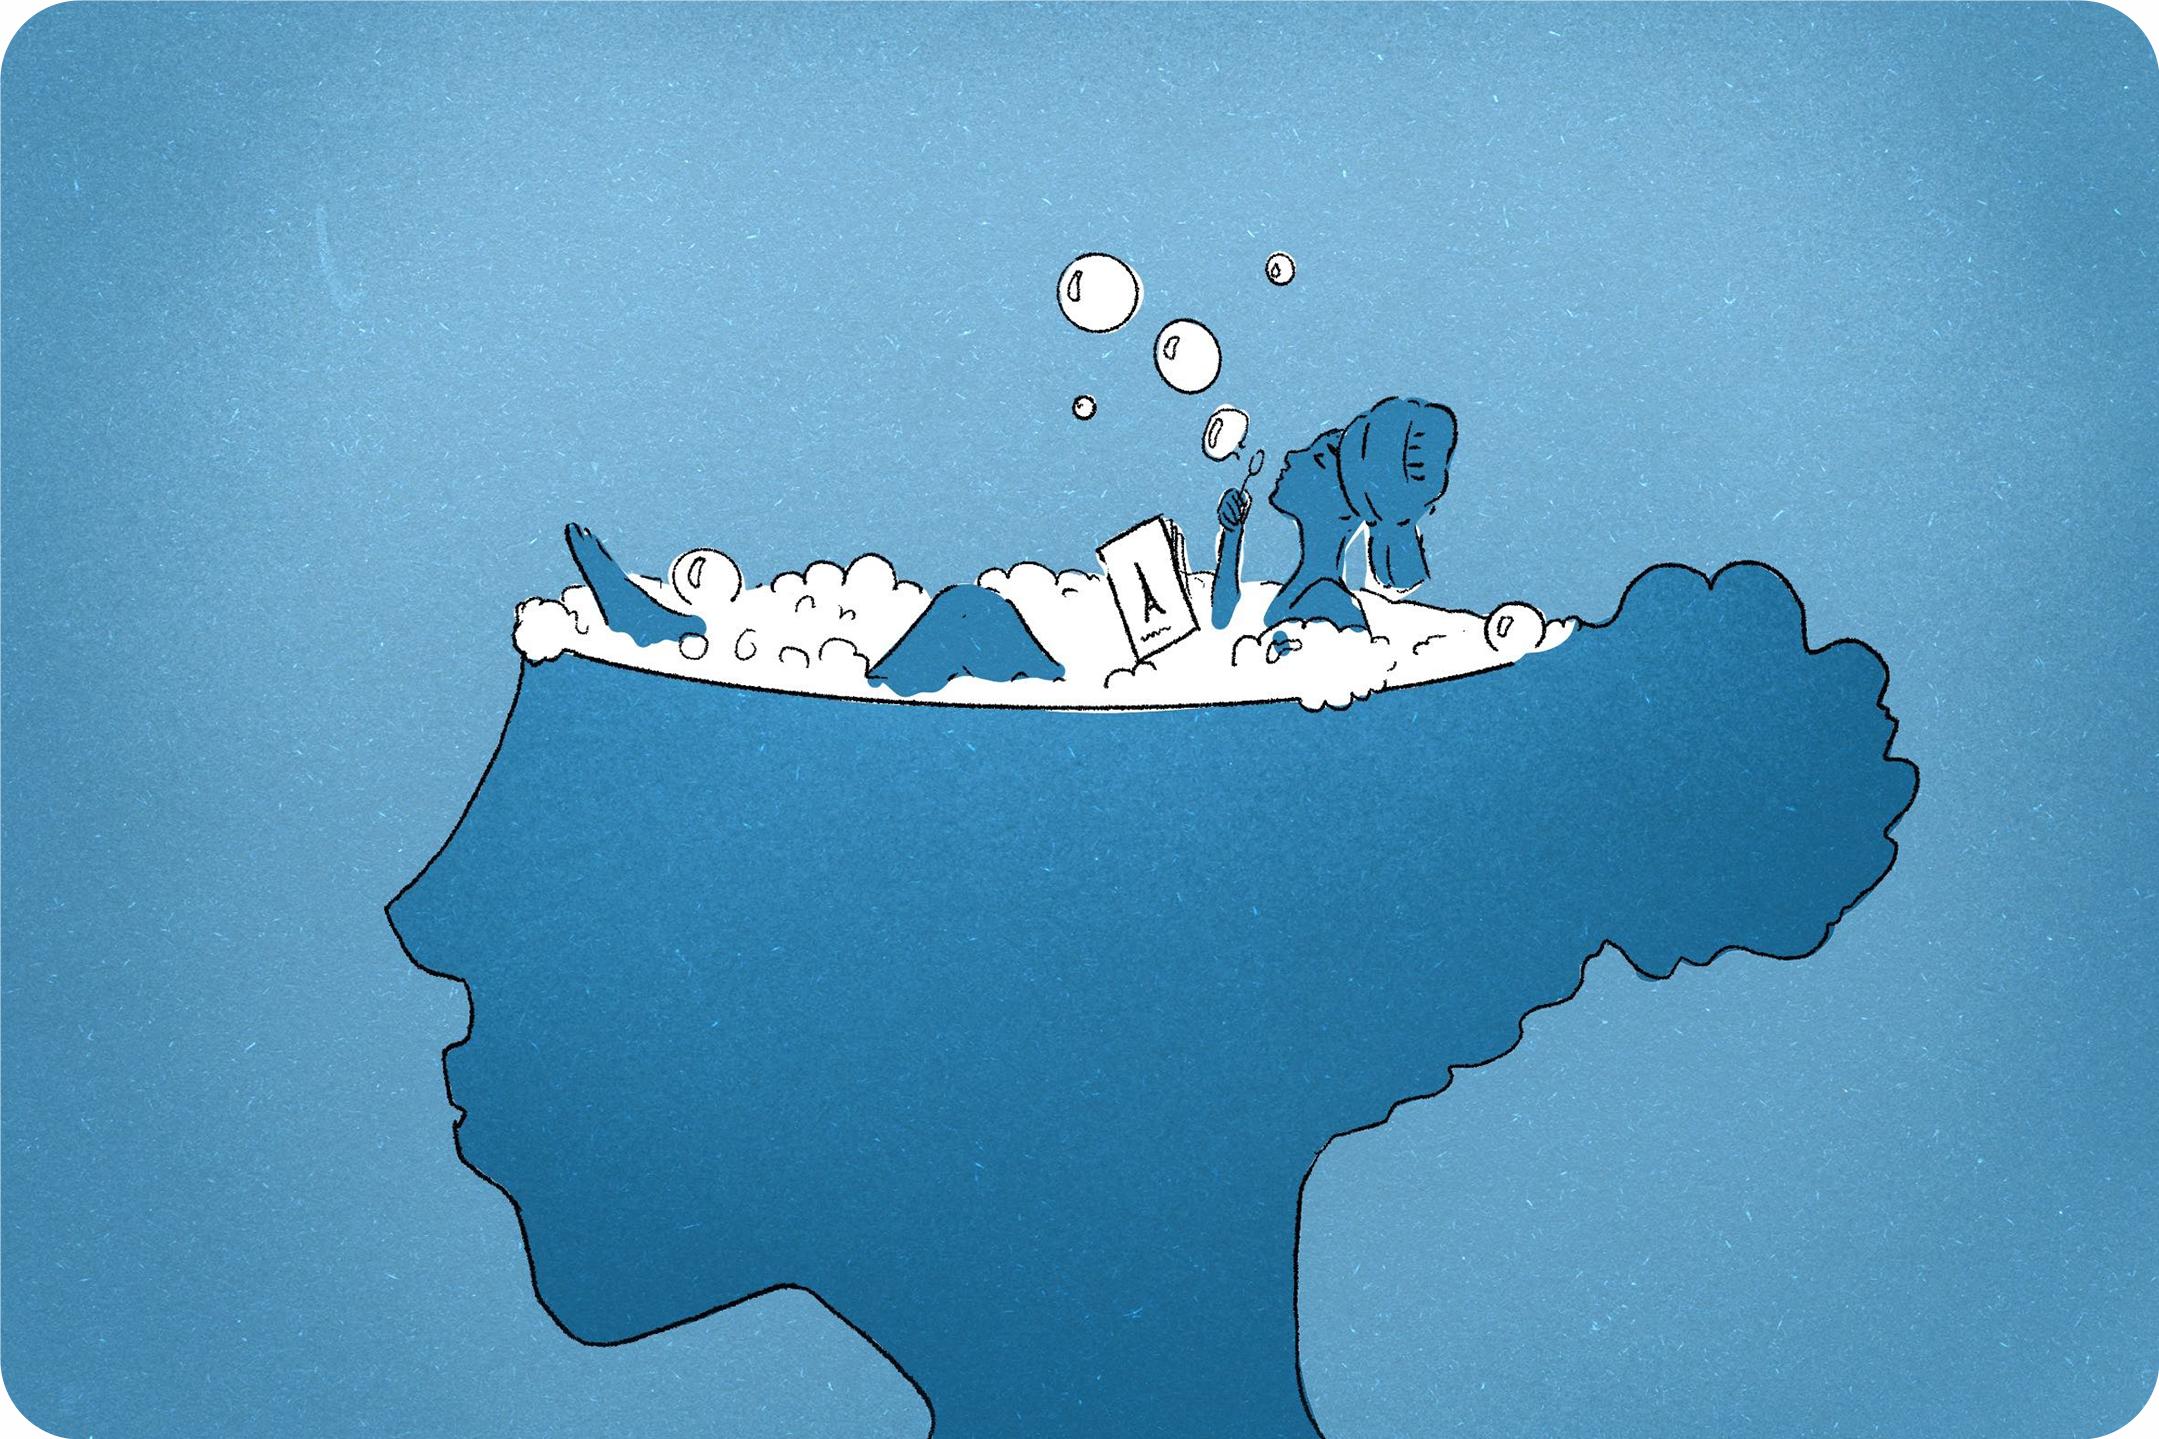 Illustration by Duane Adamoli @madamolio